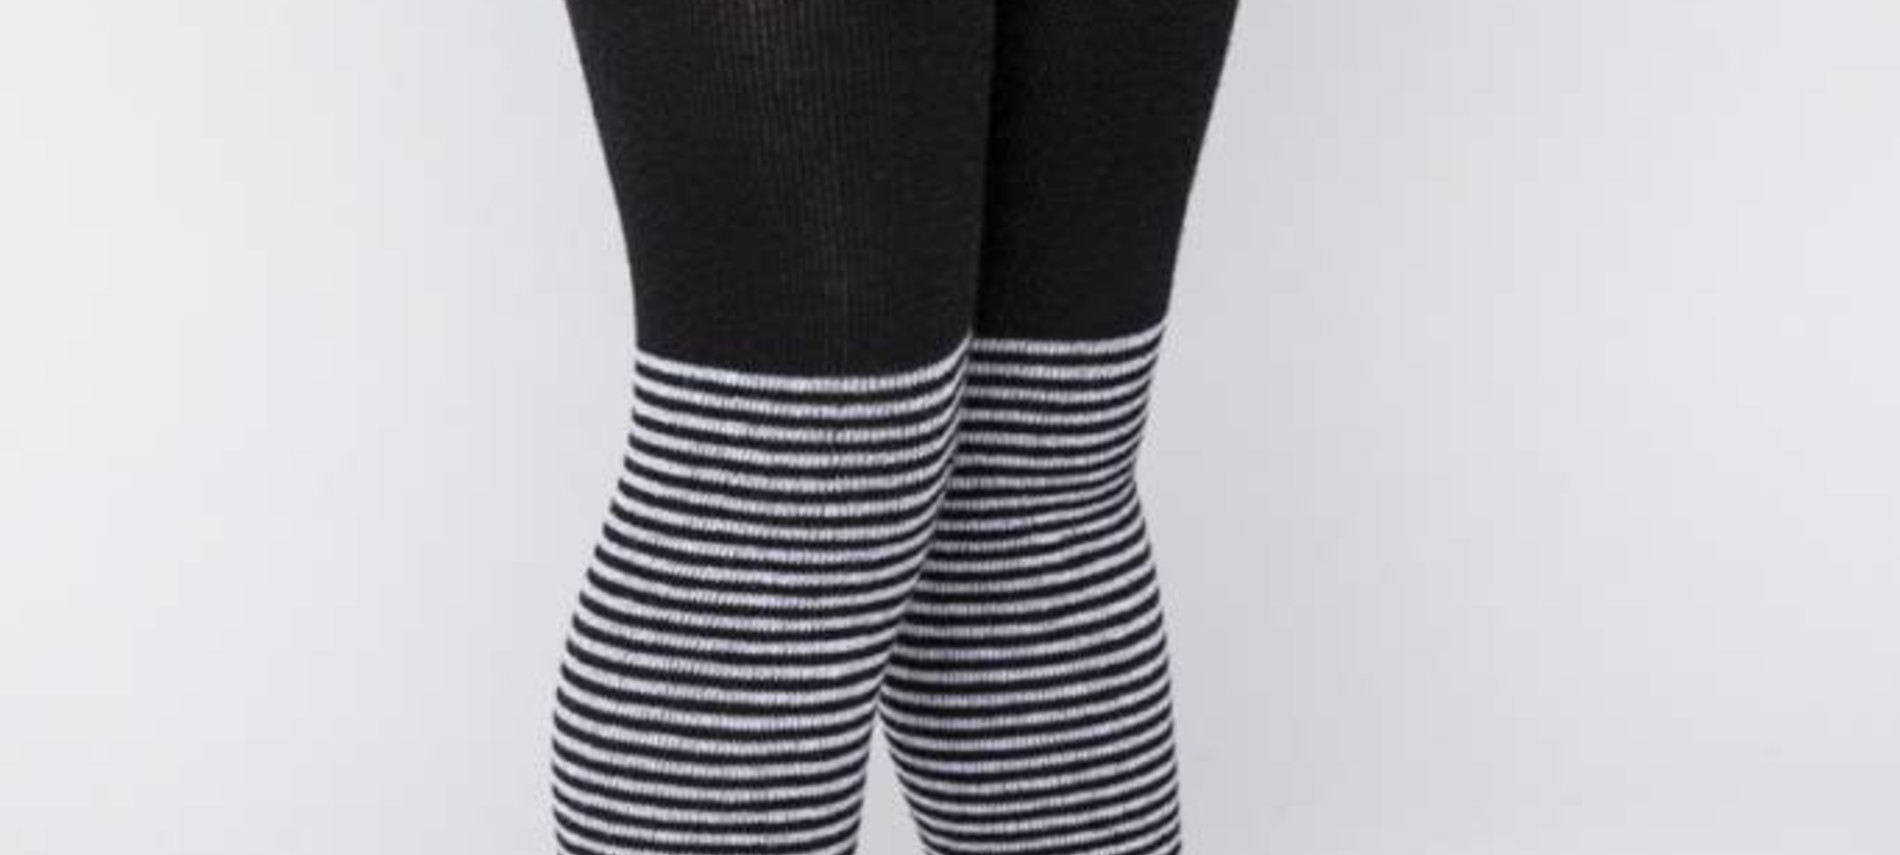 Tights Stripes